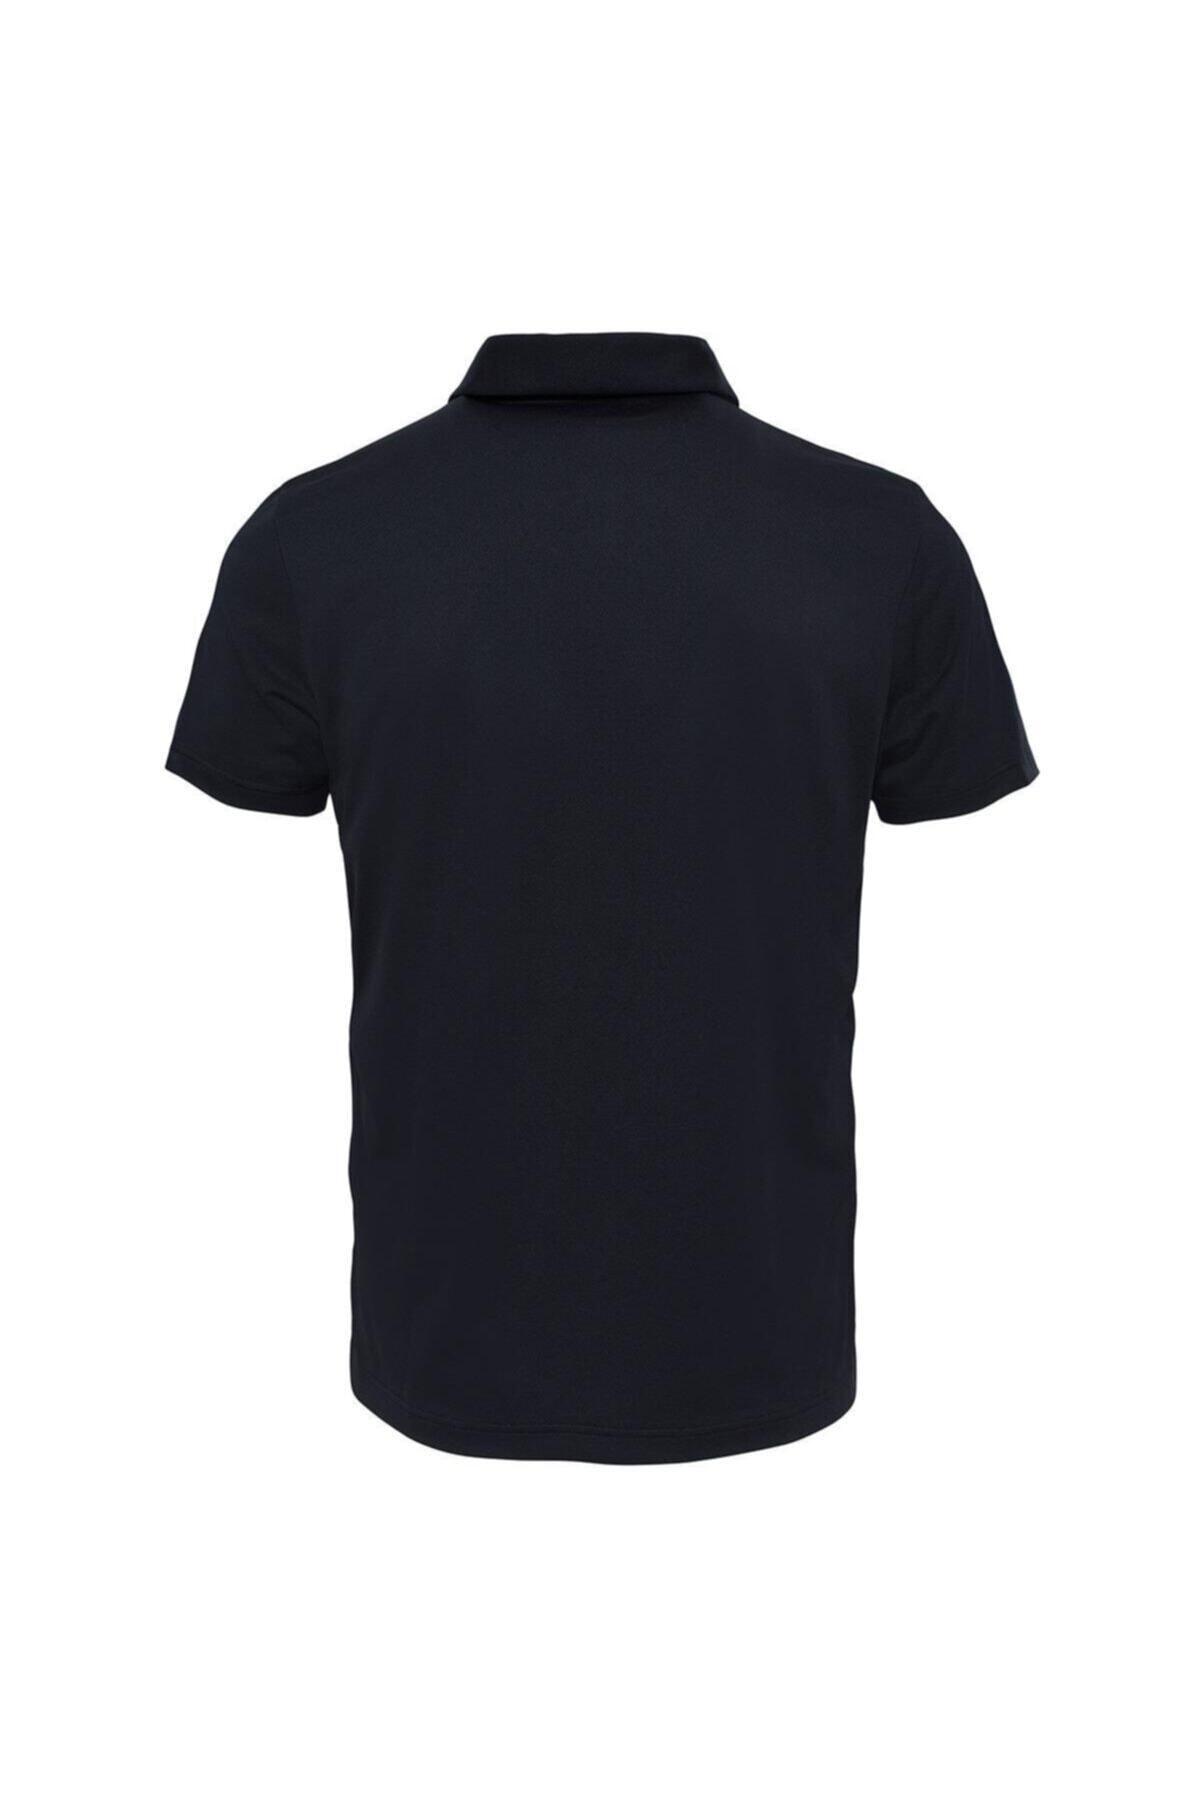 THE NORTH FACE Tanken Polo Erkek T-shirt Siyah 2